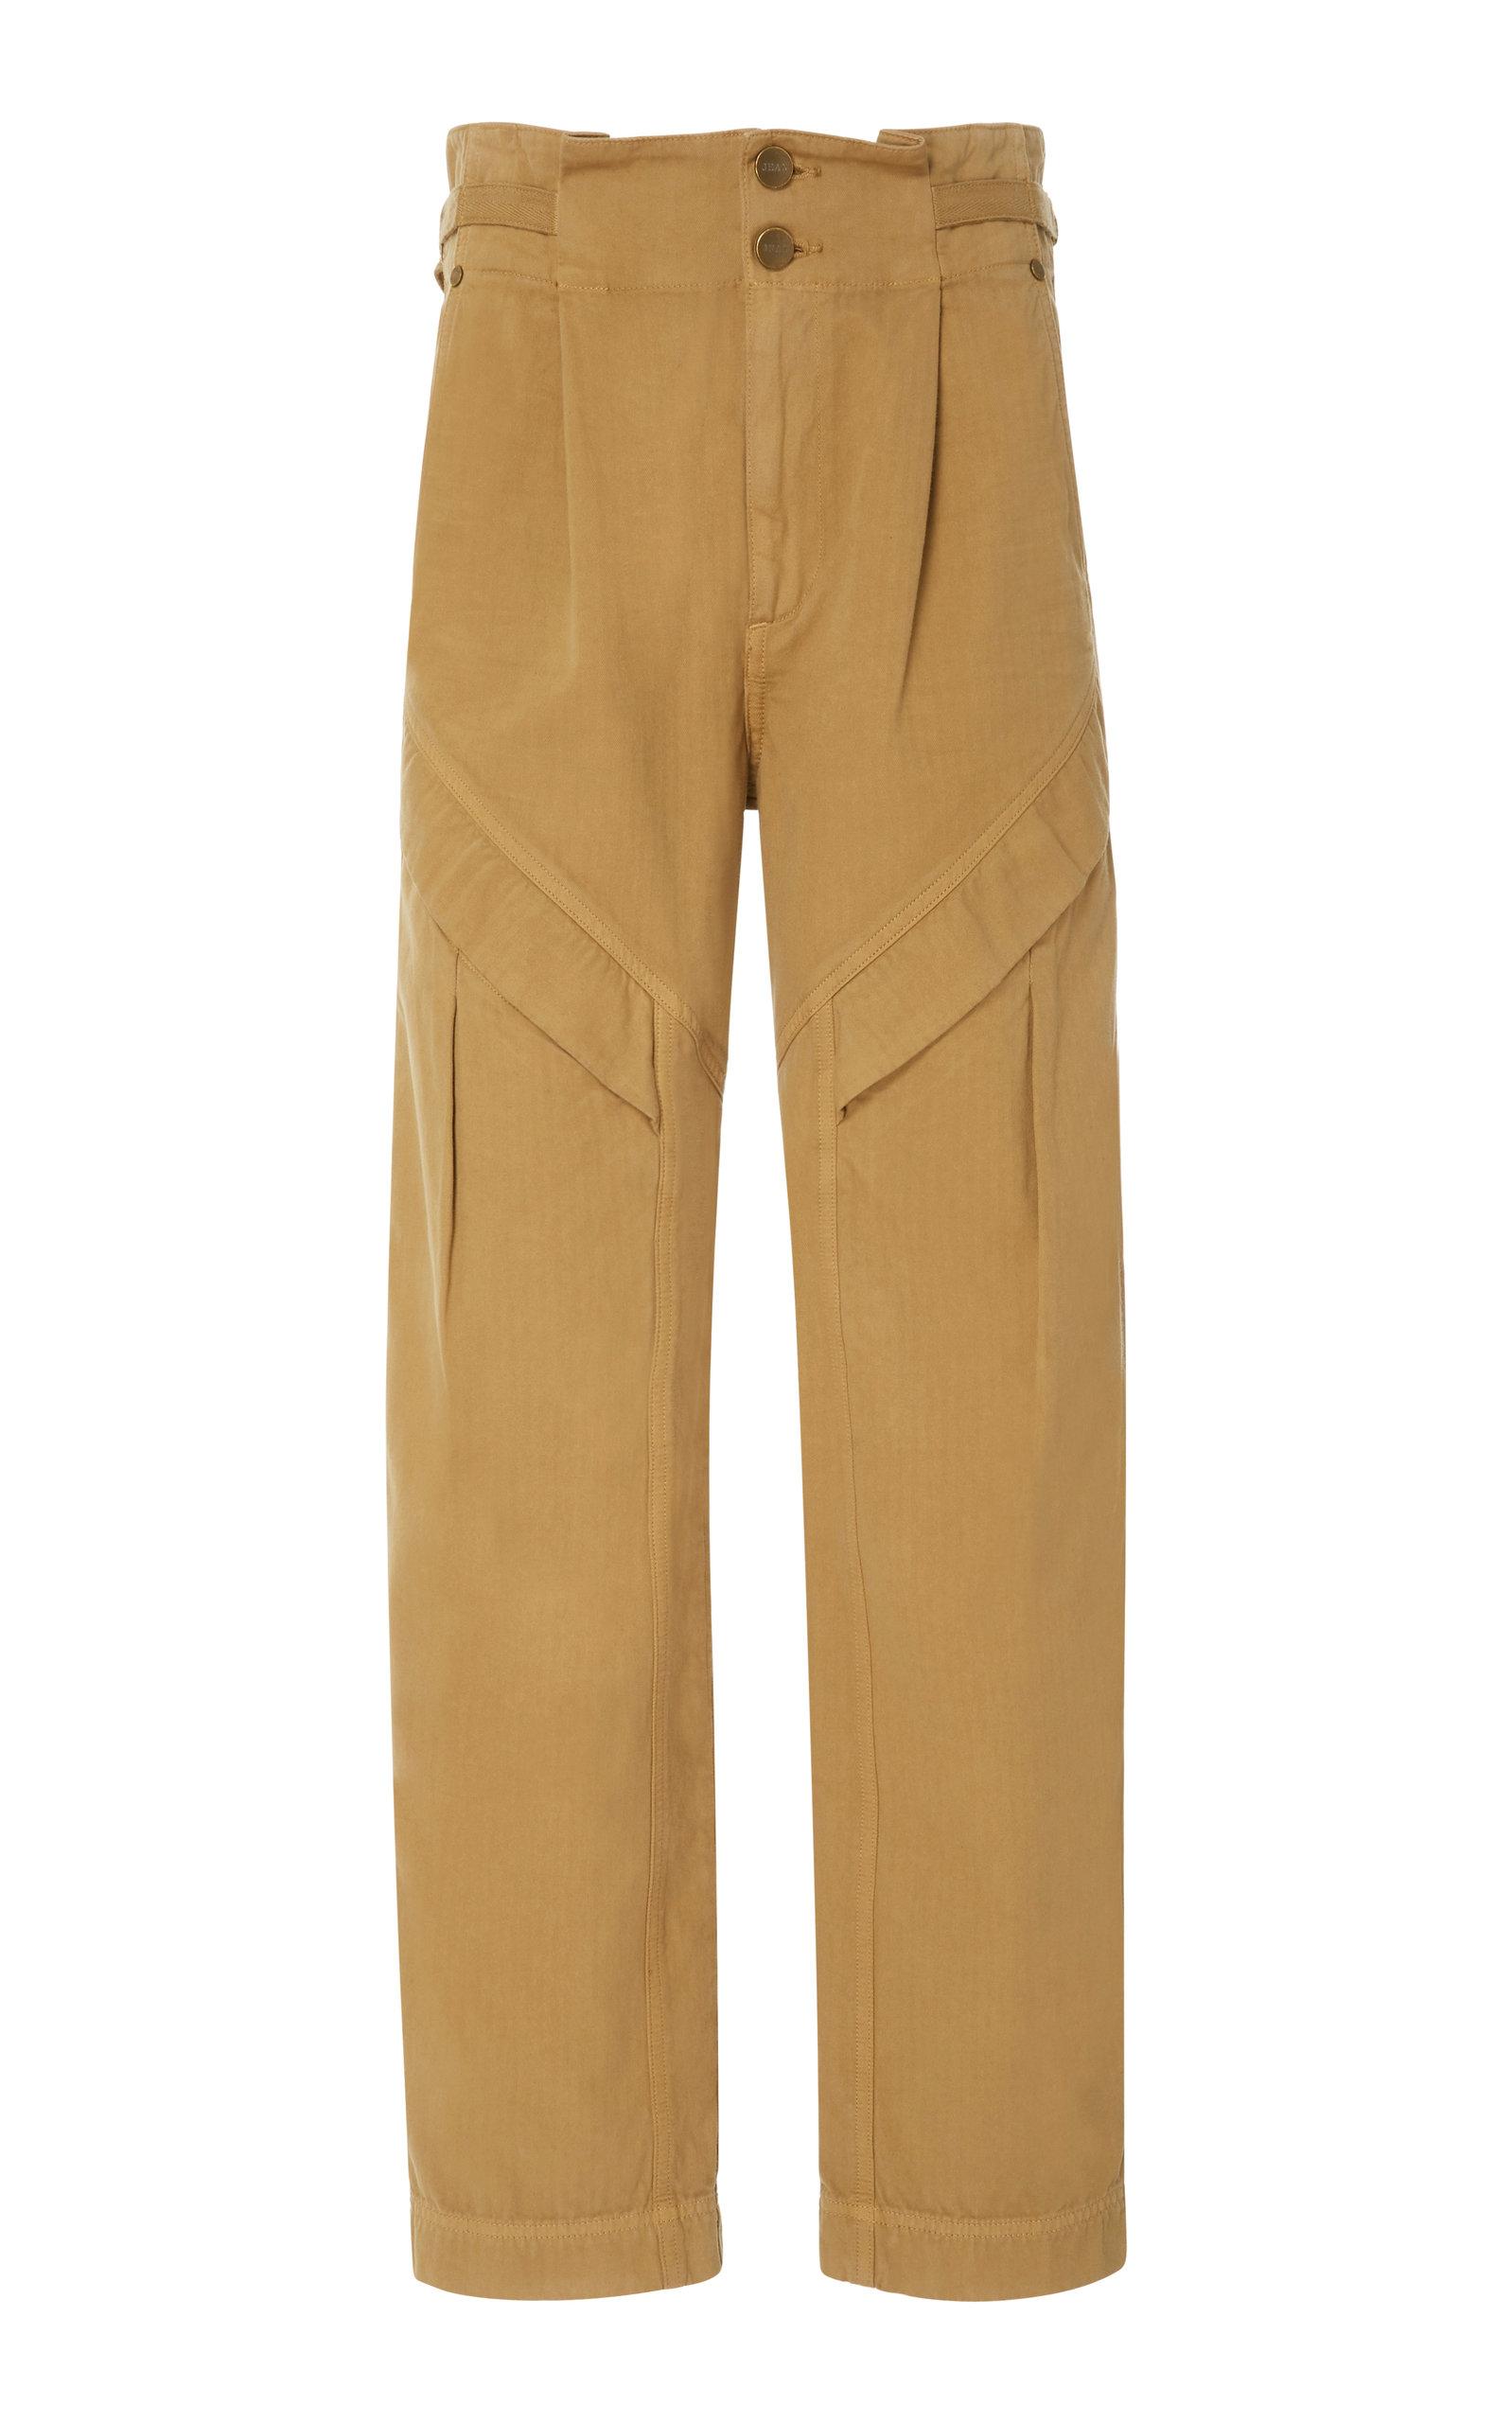 JEAN ATELIER Gemma Ruffled Cotton Straight-Leg Pant in Camel